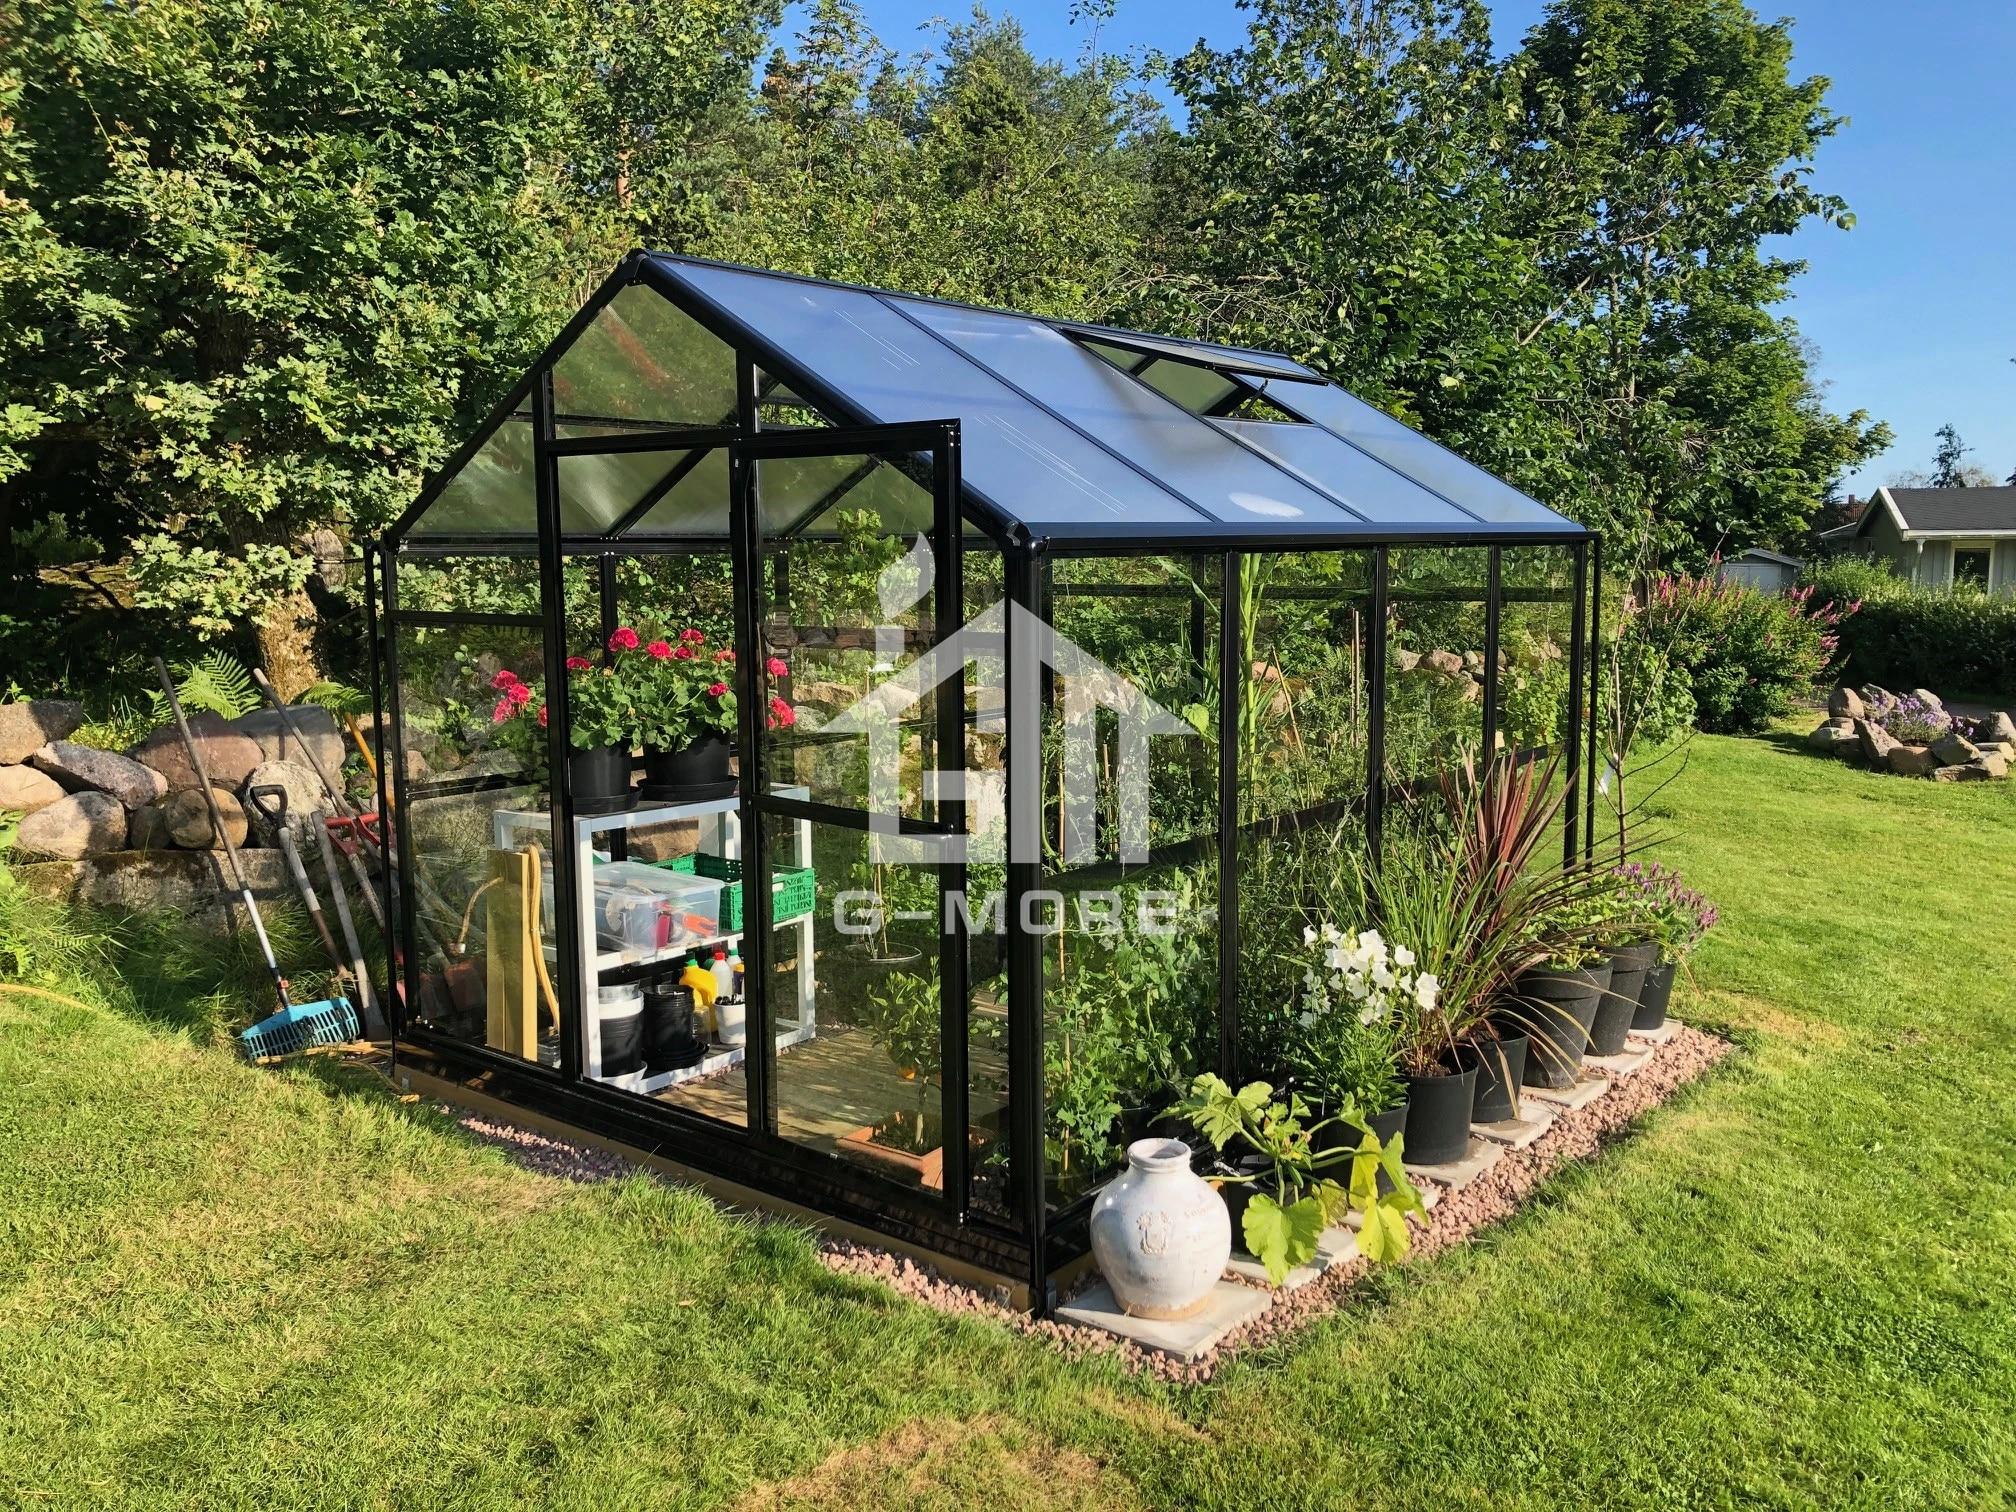 Outdoor Waterproof Aluminum Gazebo Garden Green House Garden Black Color Greenhouse For Sale Garden Greenhouses Aliexpress